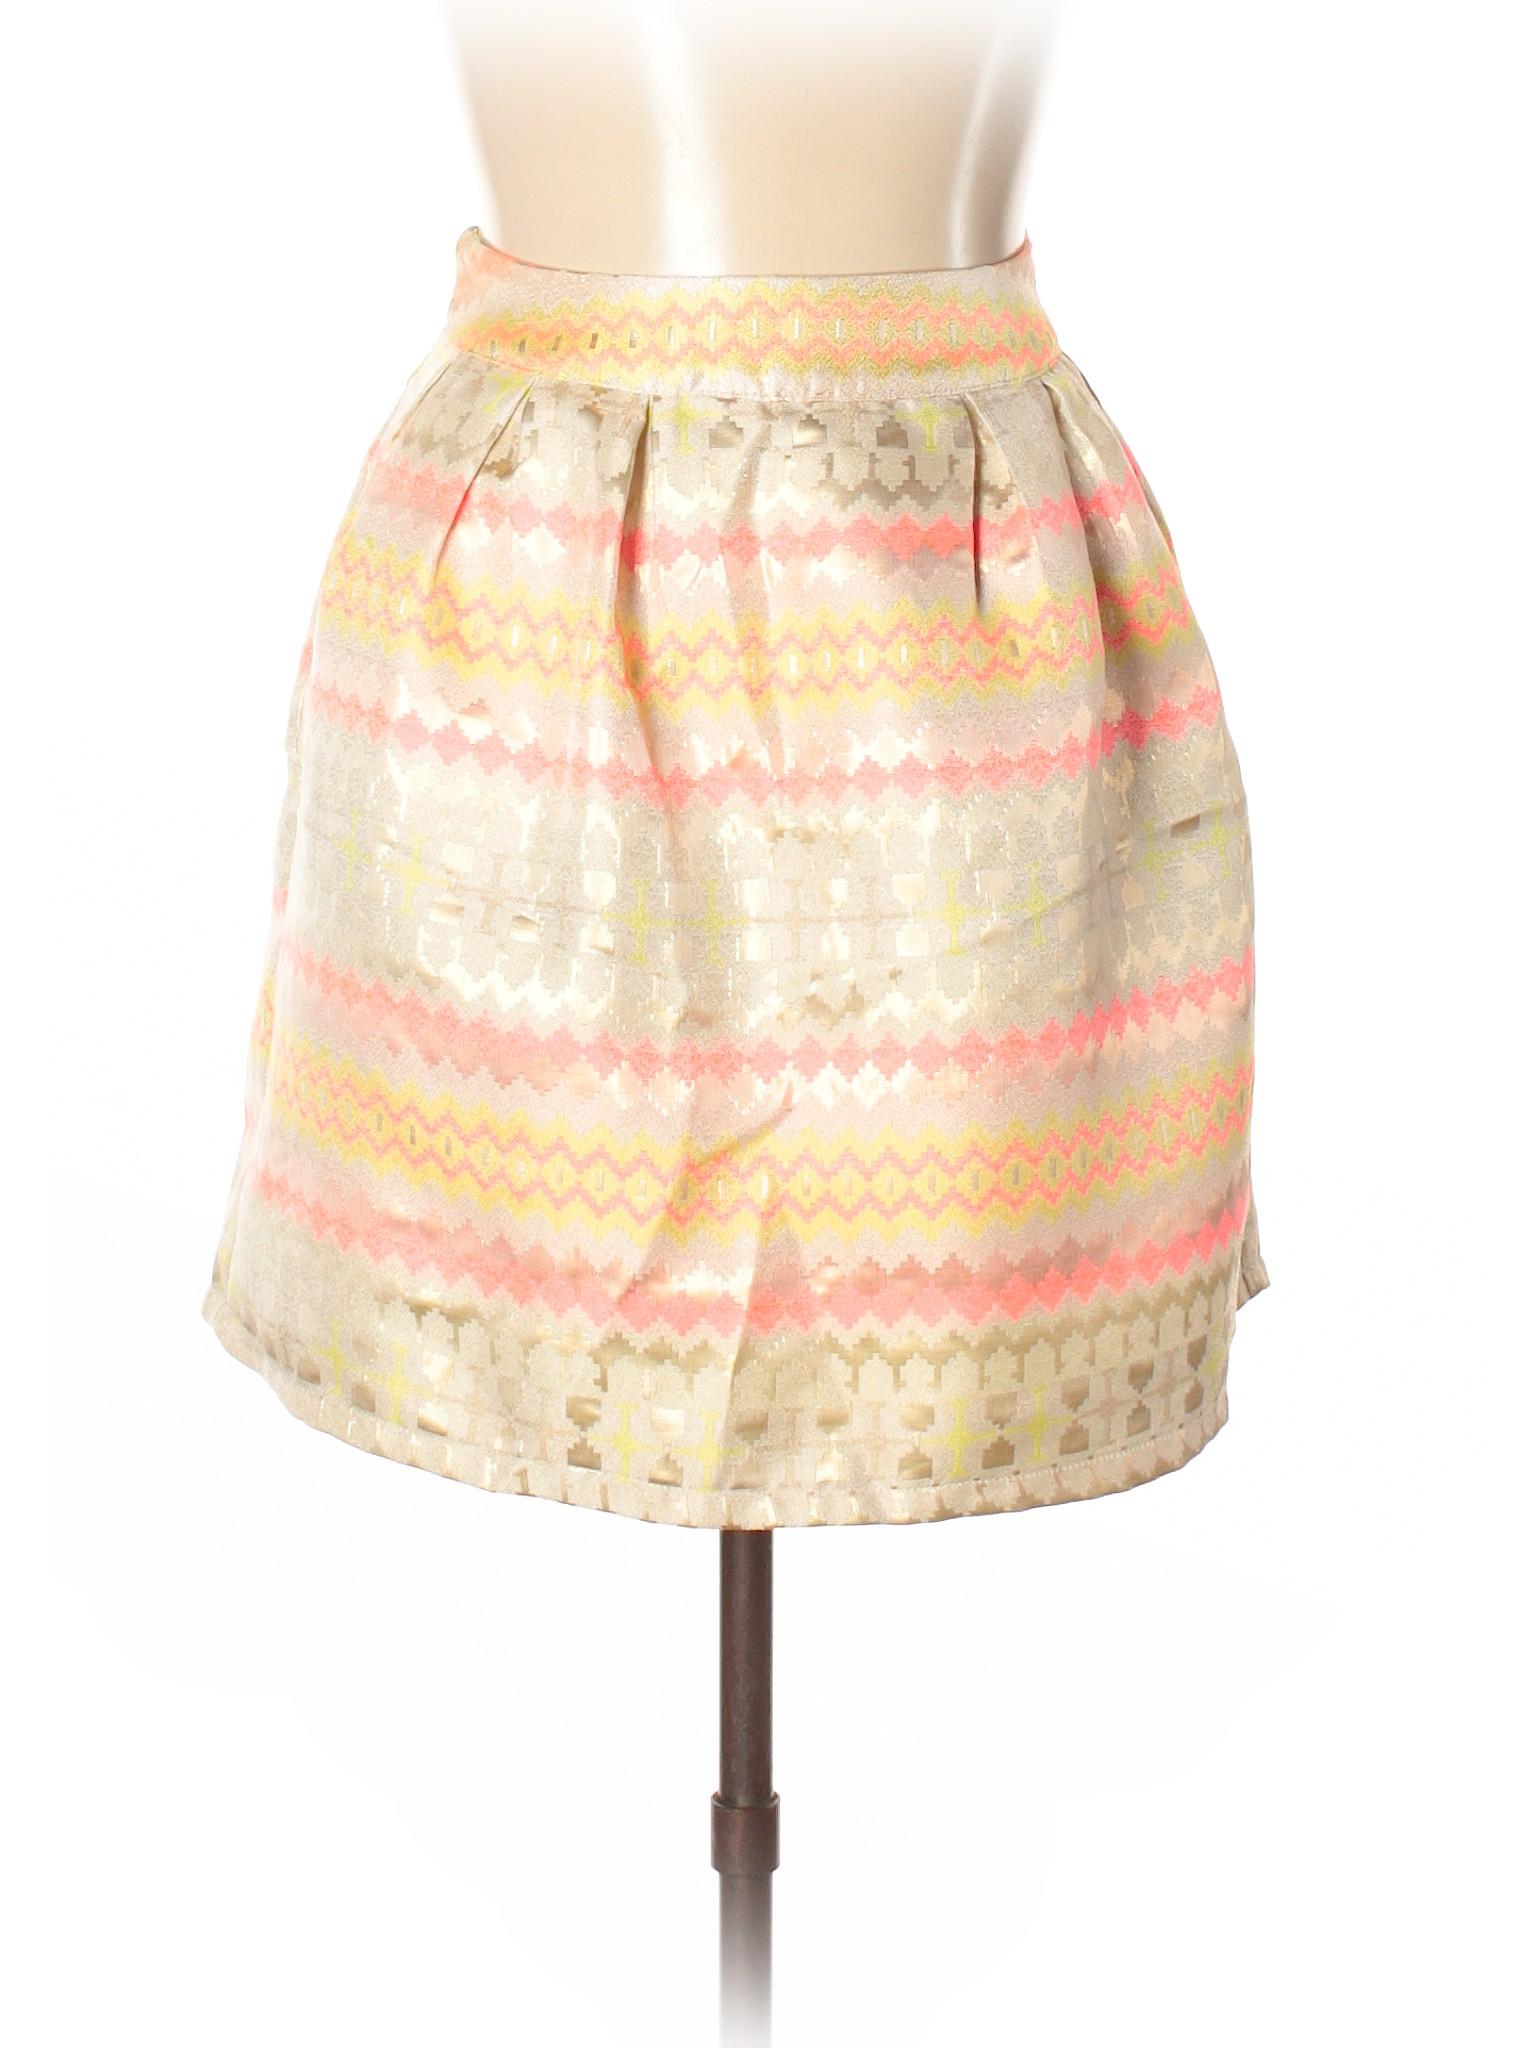 Skirt Skirt Casual Boutique Casual Skirt Boutique Boutique Boutique Casual Casual BTSqFT